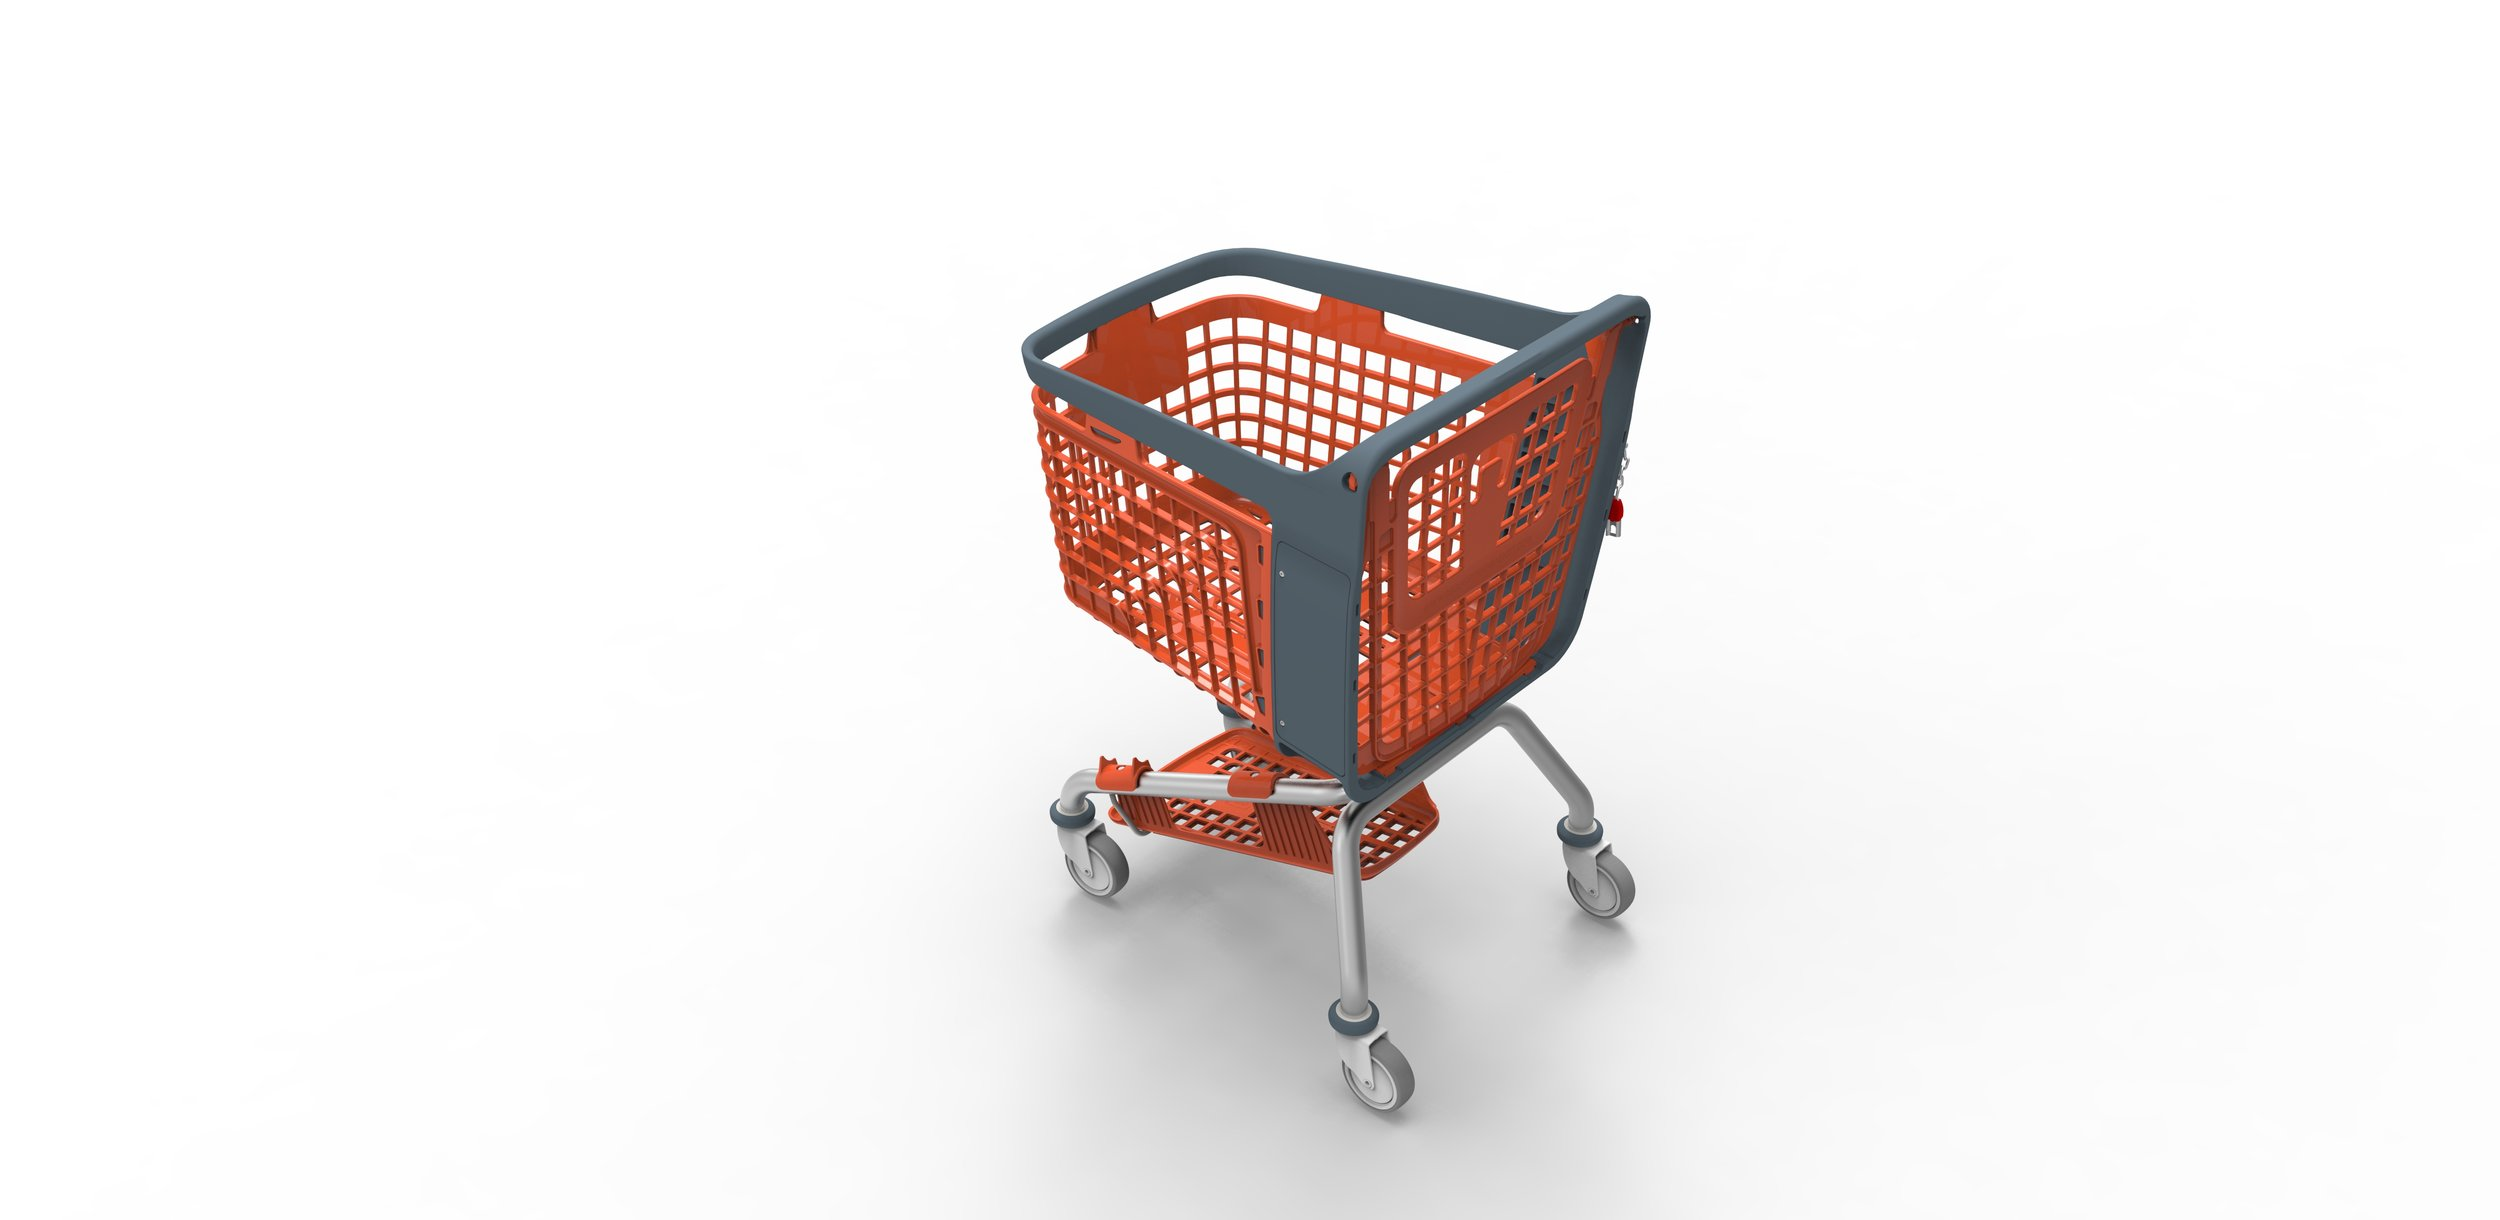 bravo-carrito-supermercado-render